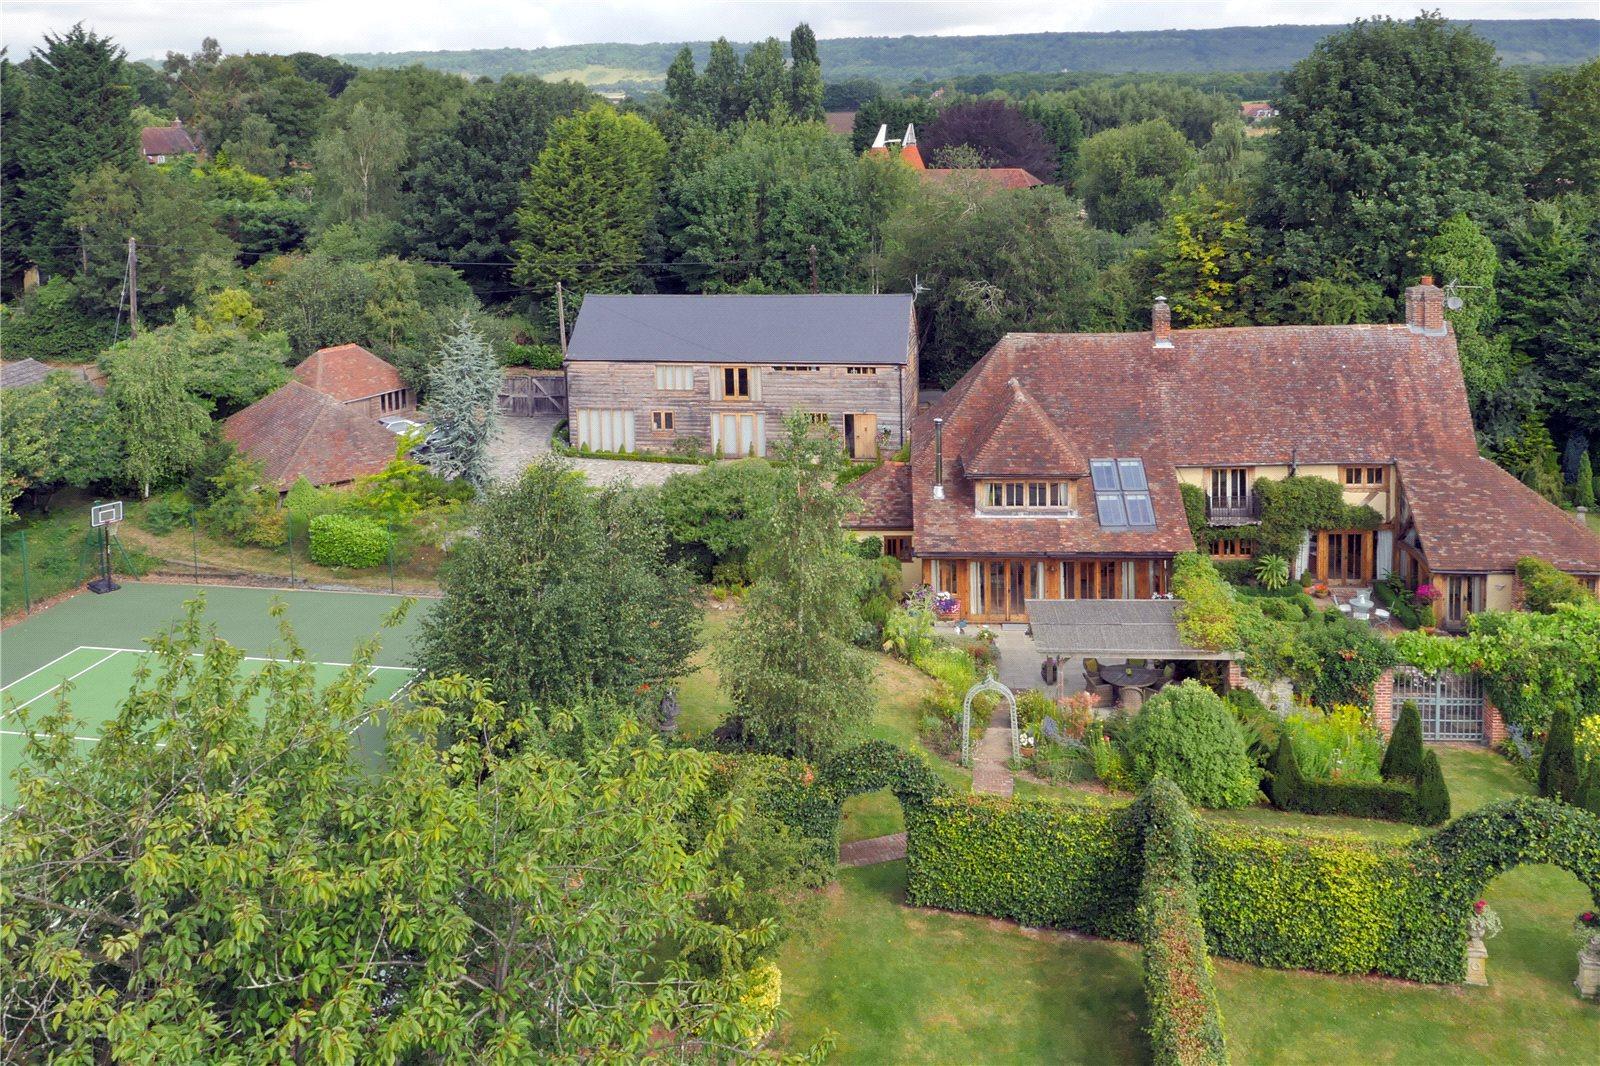 Tek Ailelik Ev için Satış at Mill House Lane, Addington,West Malling, Nr Sevenoaks, Kent, ME19 Kent, Ingiltere